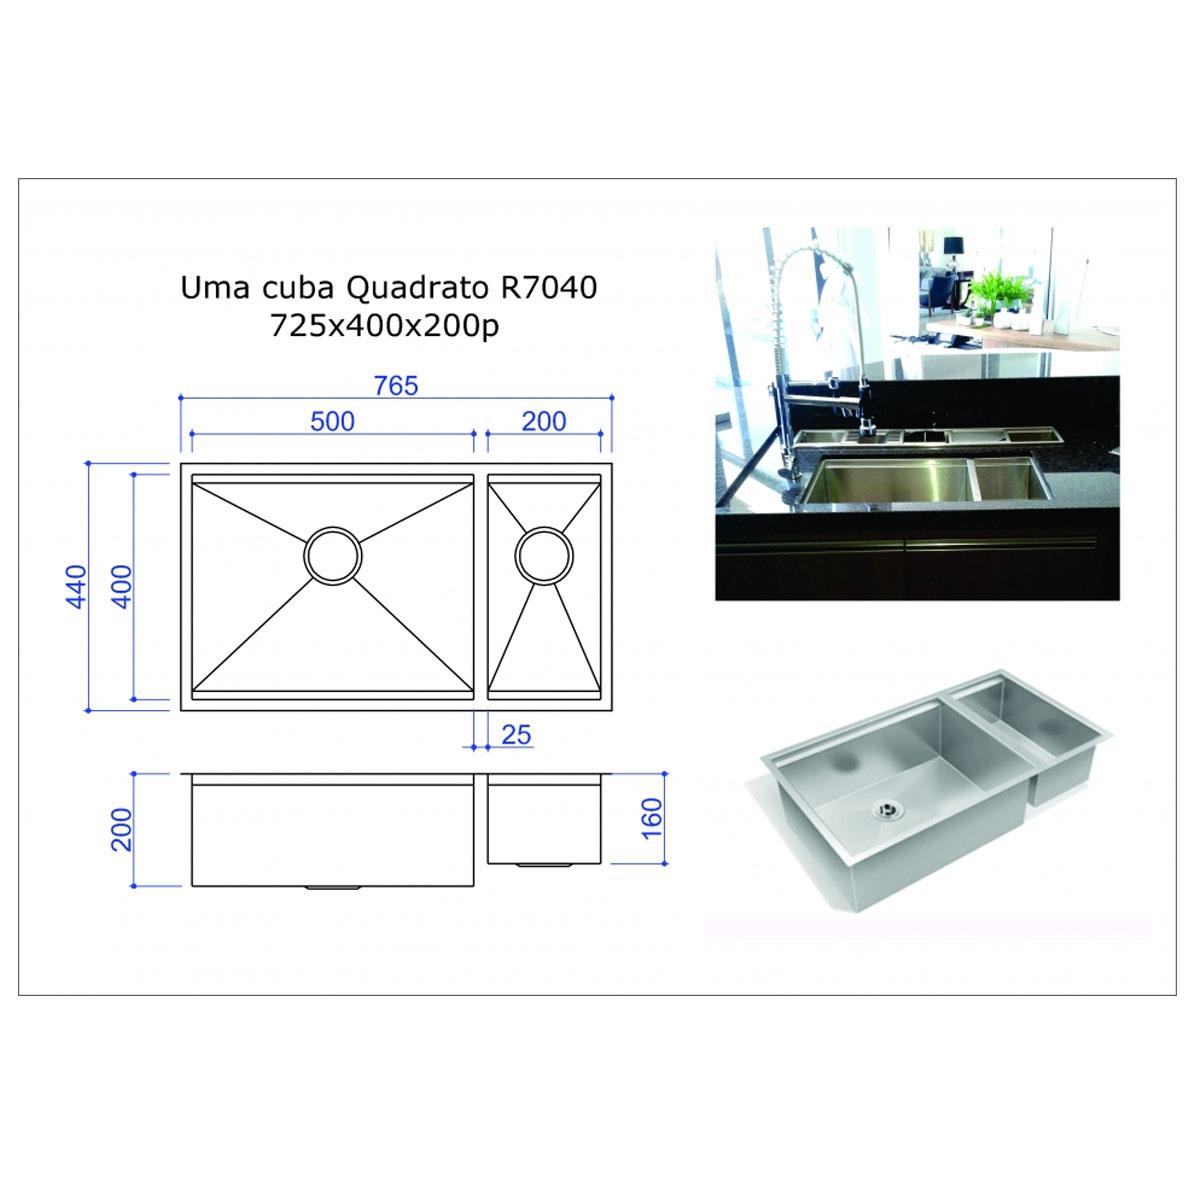 Cuba Dupla de Aço Inox 304 Quadrato R7040 Fabrinox